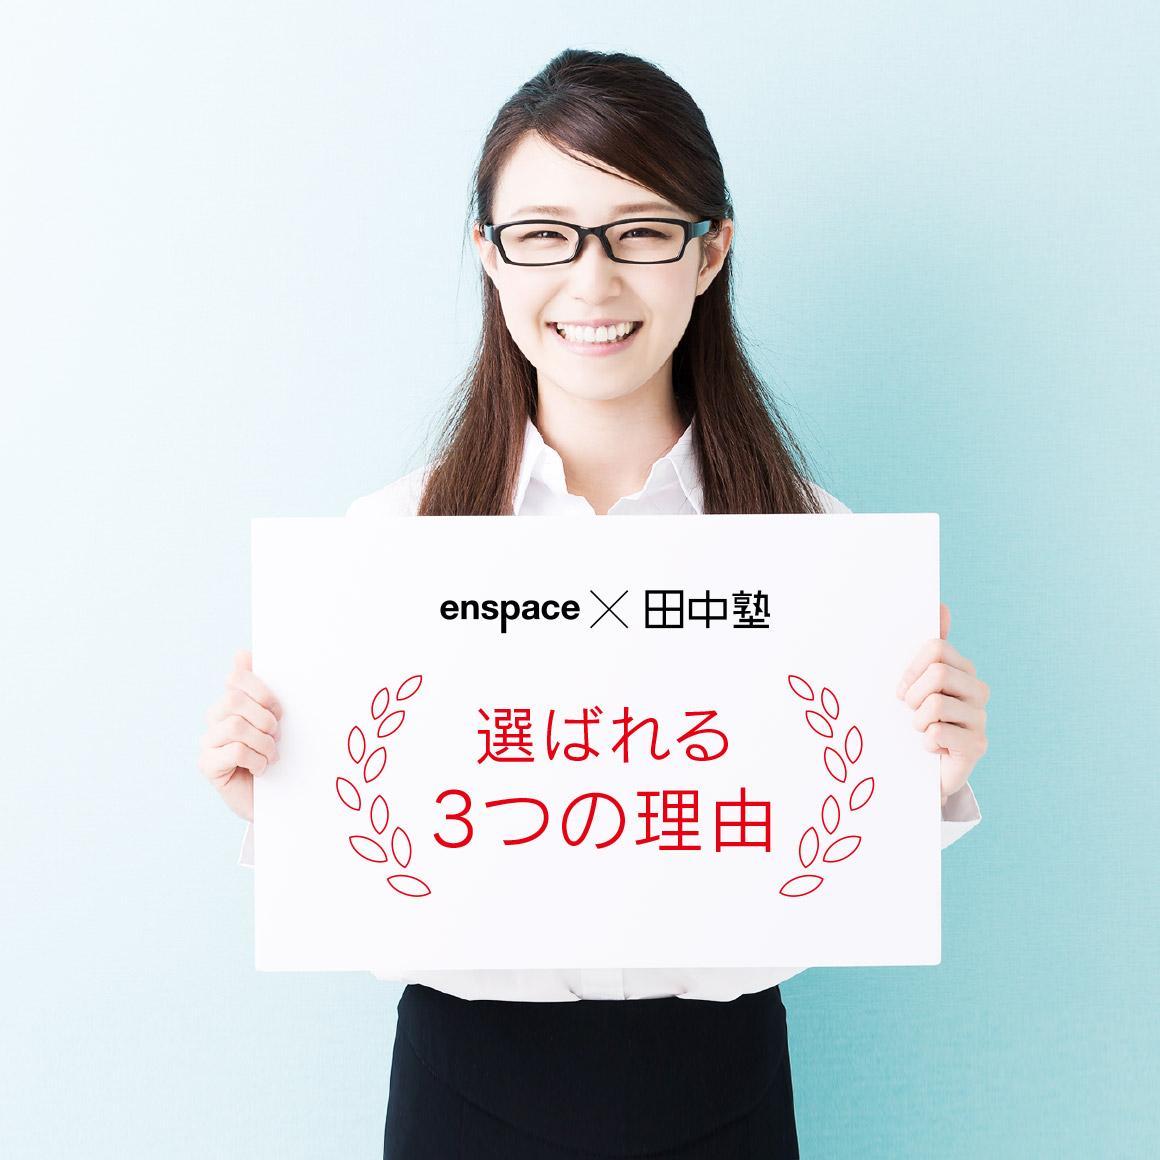 enspace-田中塾 選ばれる3つの理由